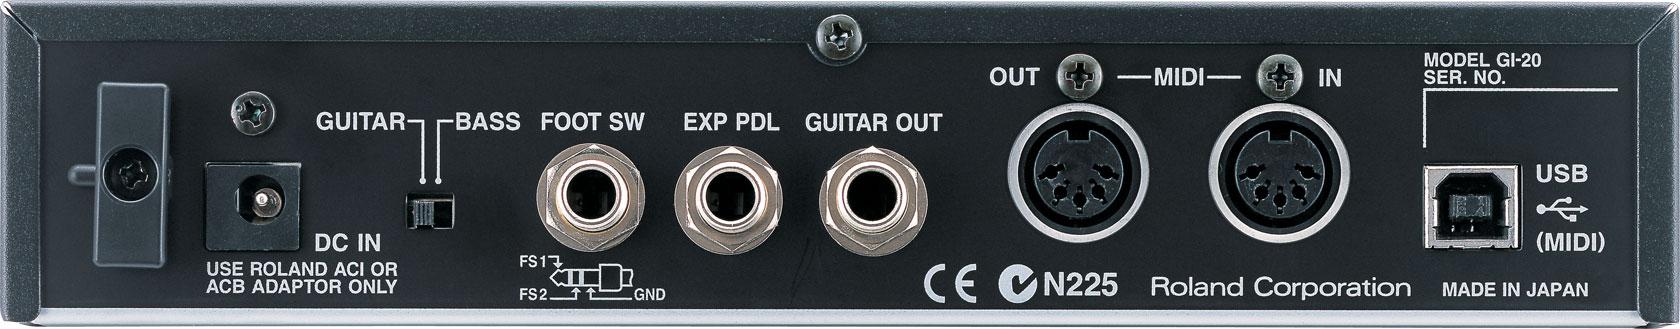 roland gi 20 gk midi interface rh roland com Roland Guitar to Midi Converter Roland Guitar to Midi Converter